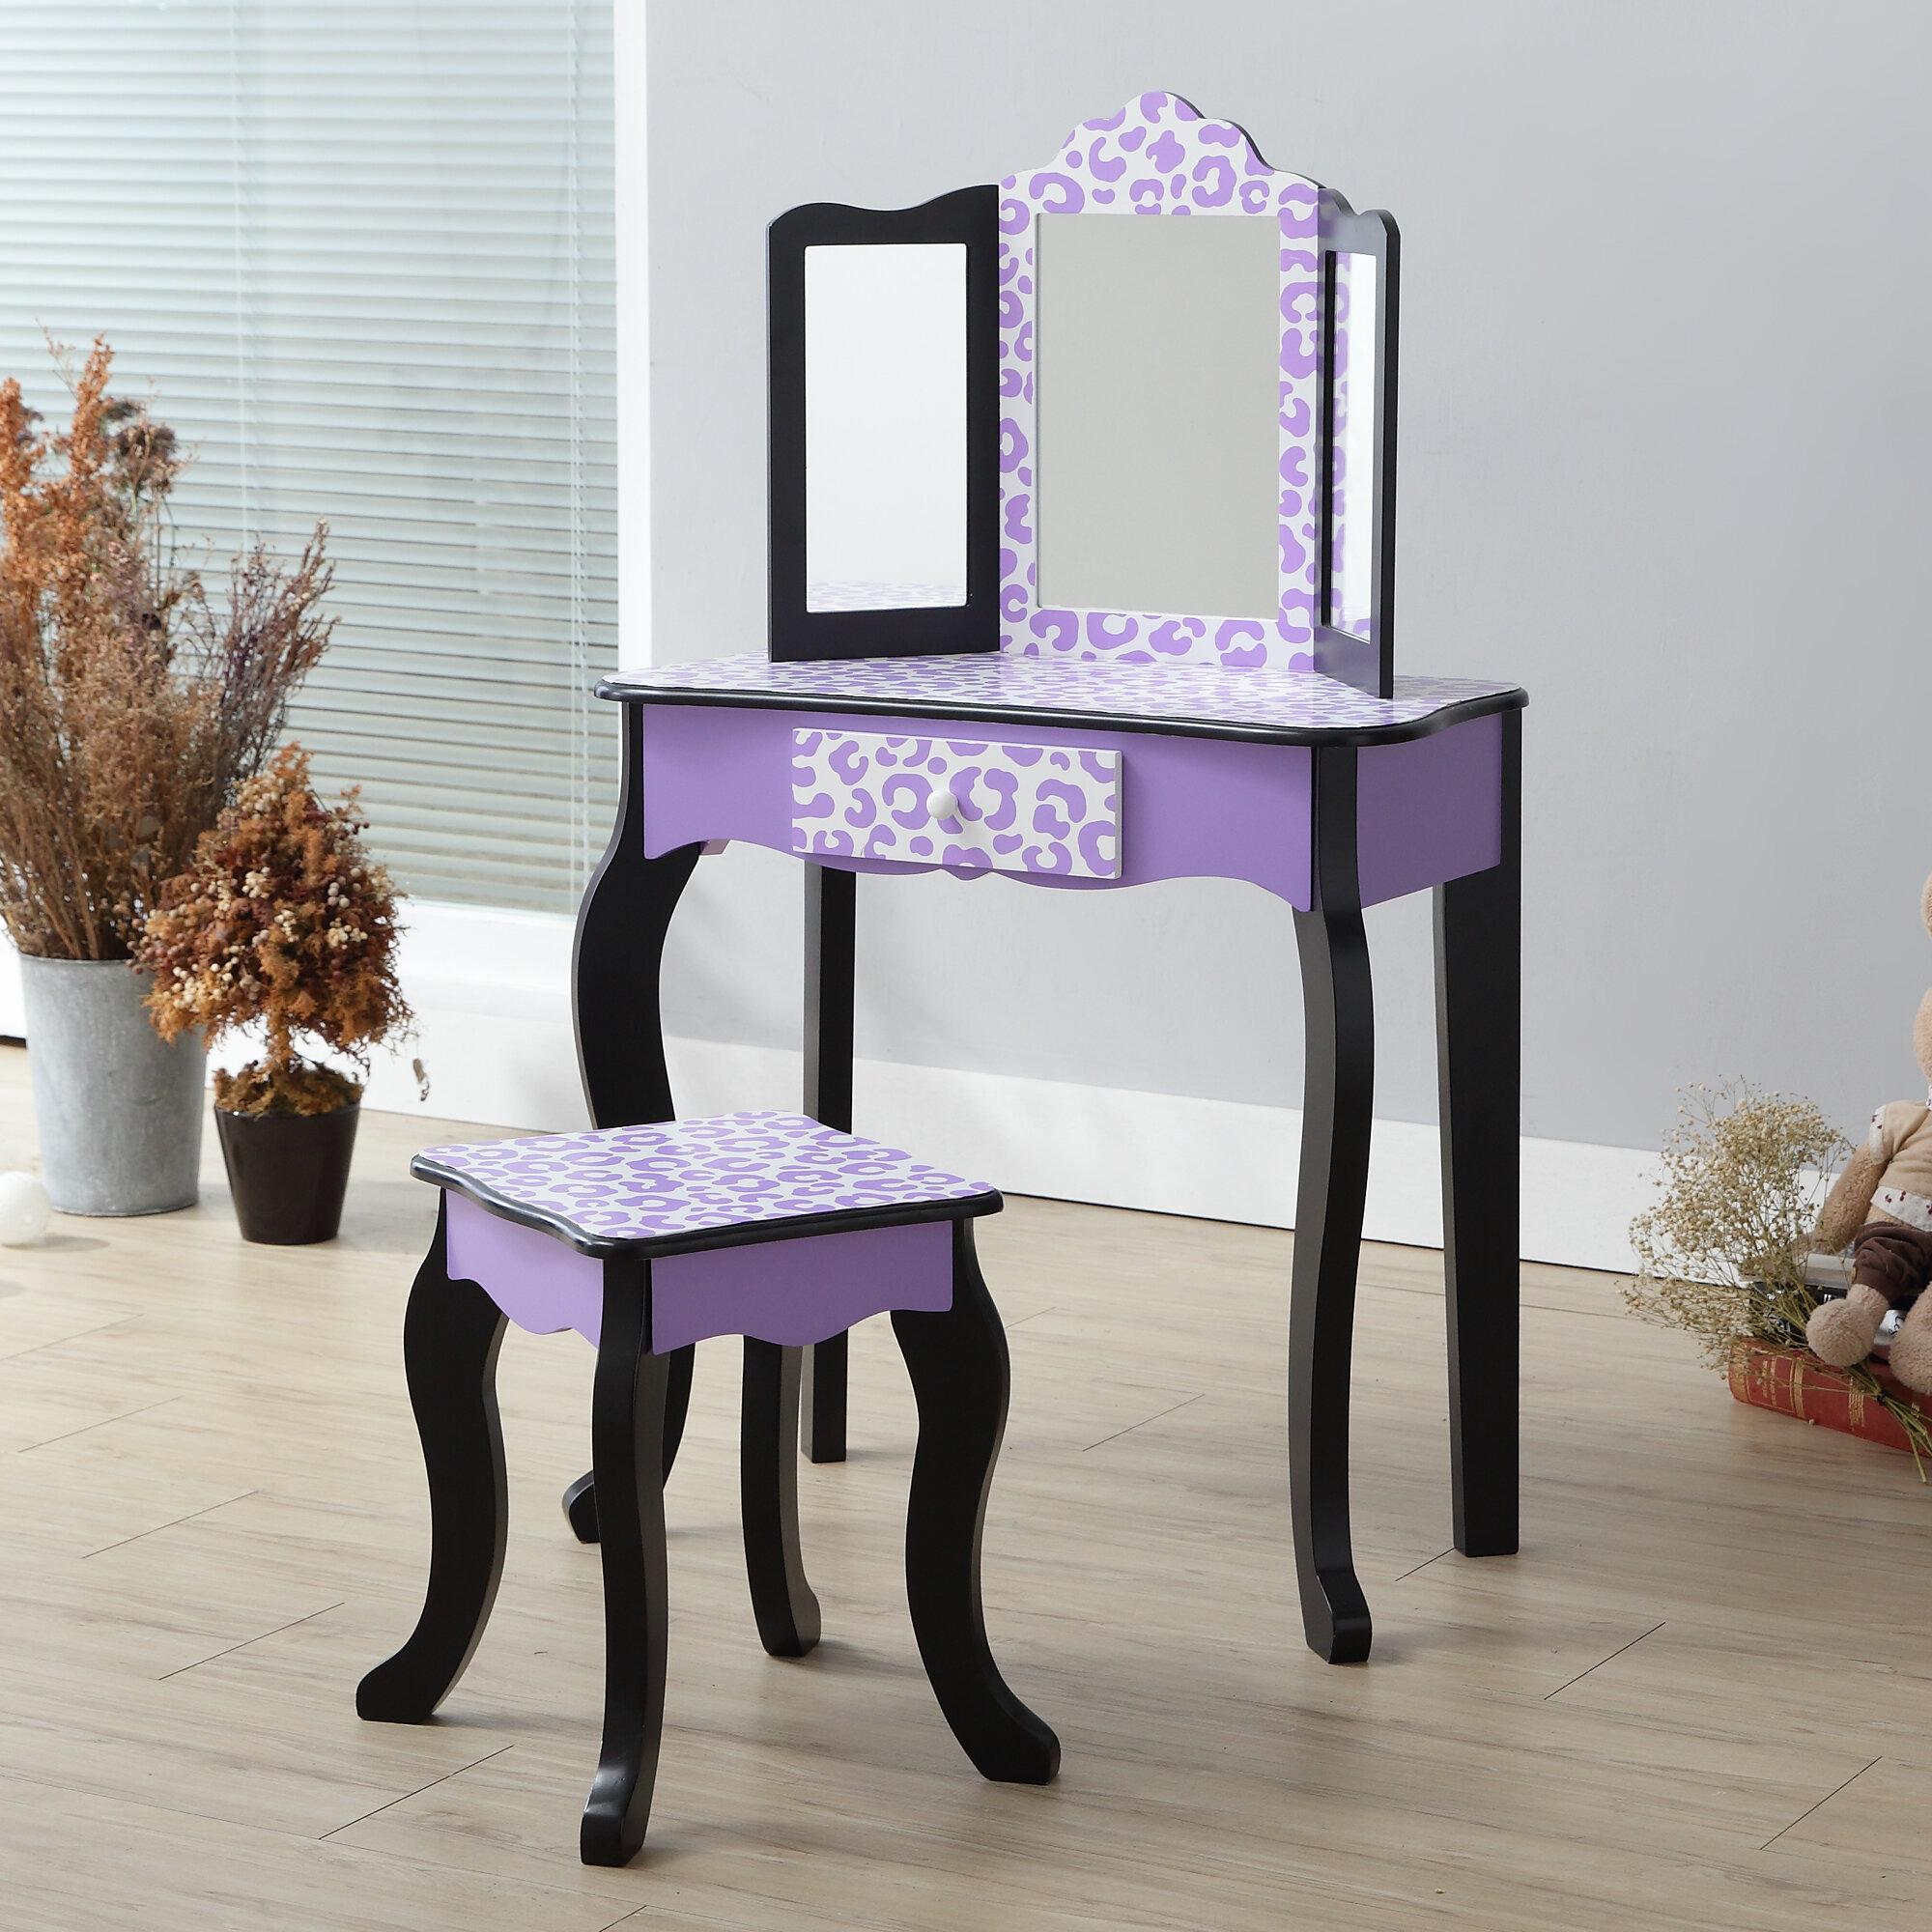 80157c41d20 Teamson kids fashion prints leopard dressing table set with mirror jpg  2000x2000 Leopard trim mirror